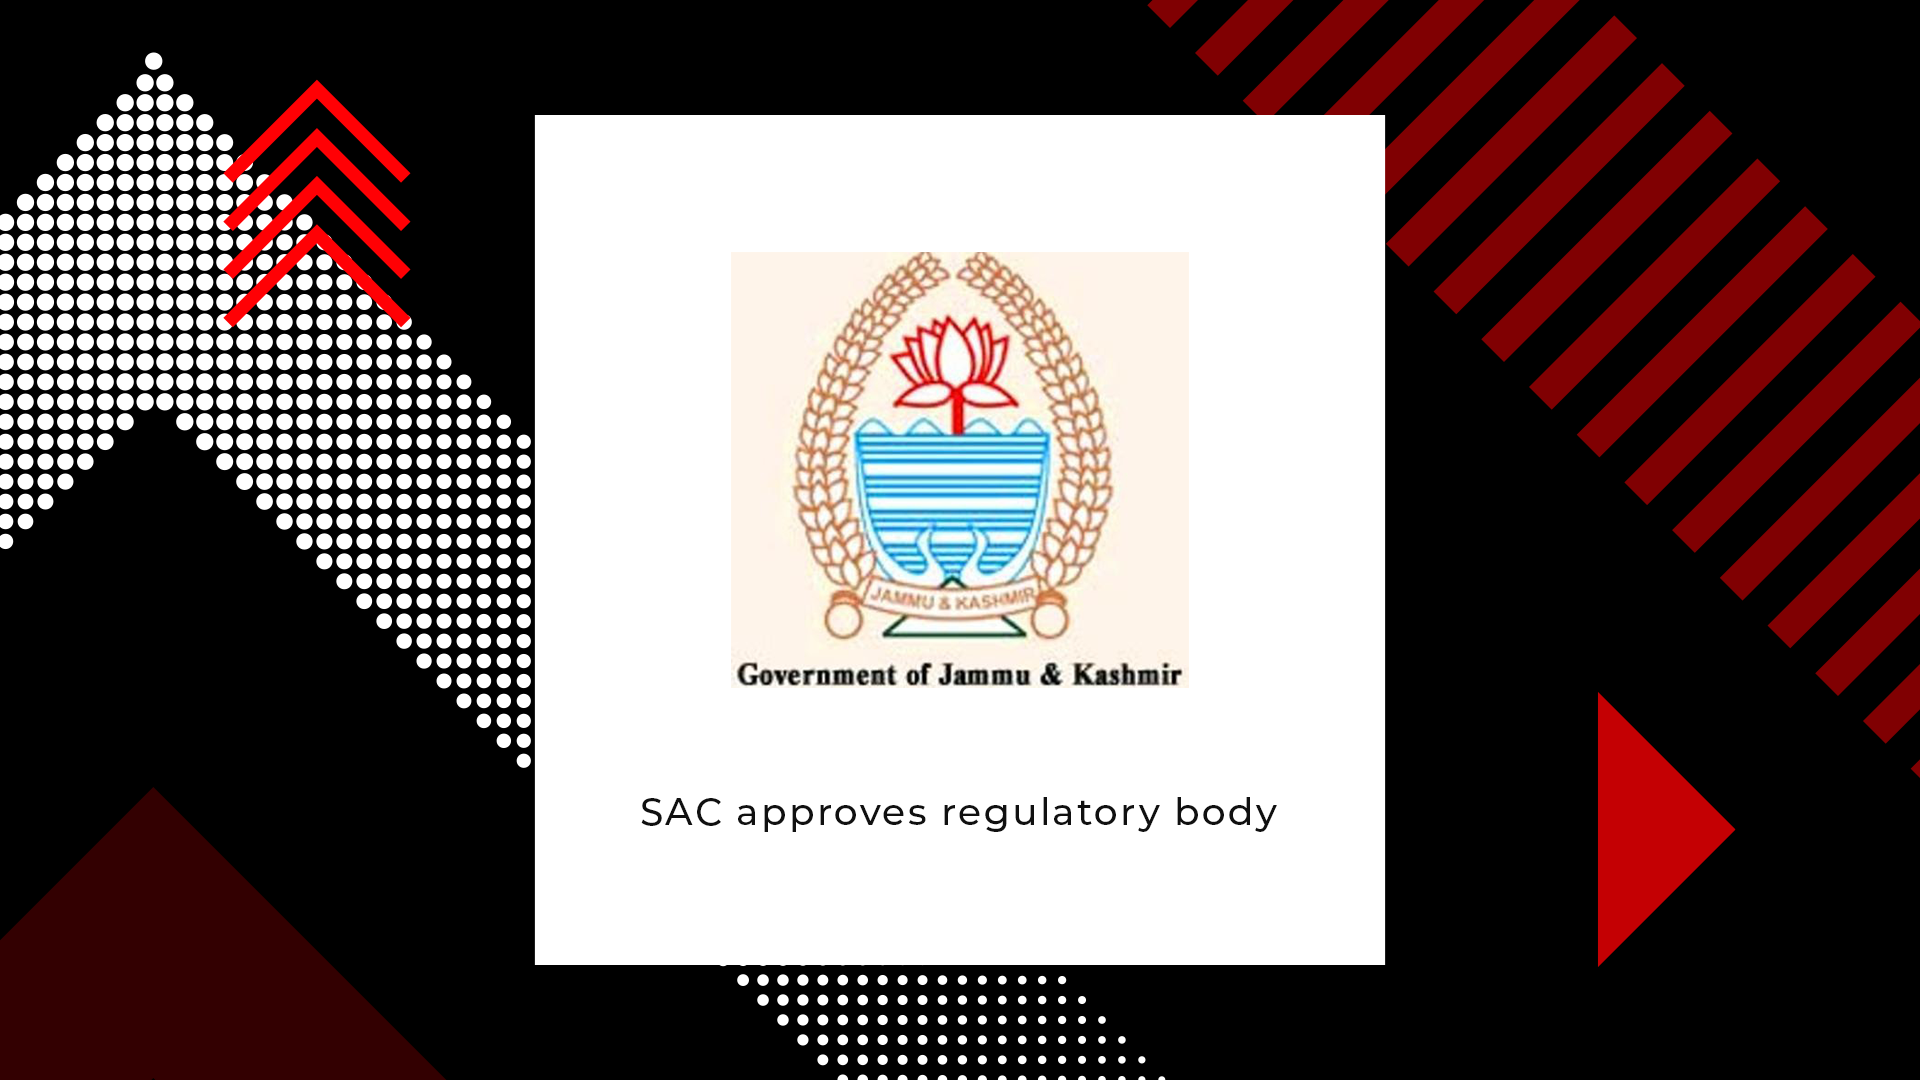 SAC approves regulatory body